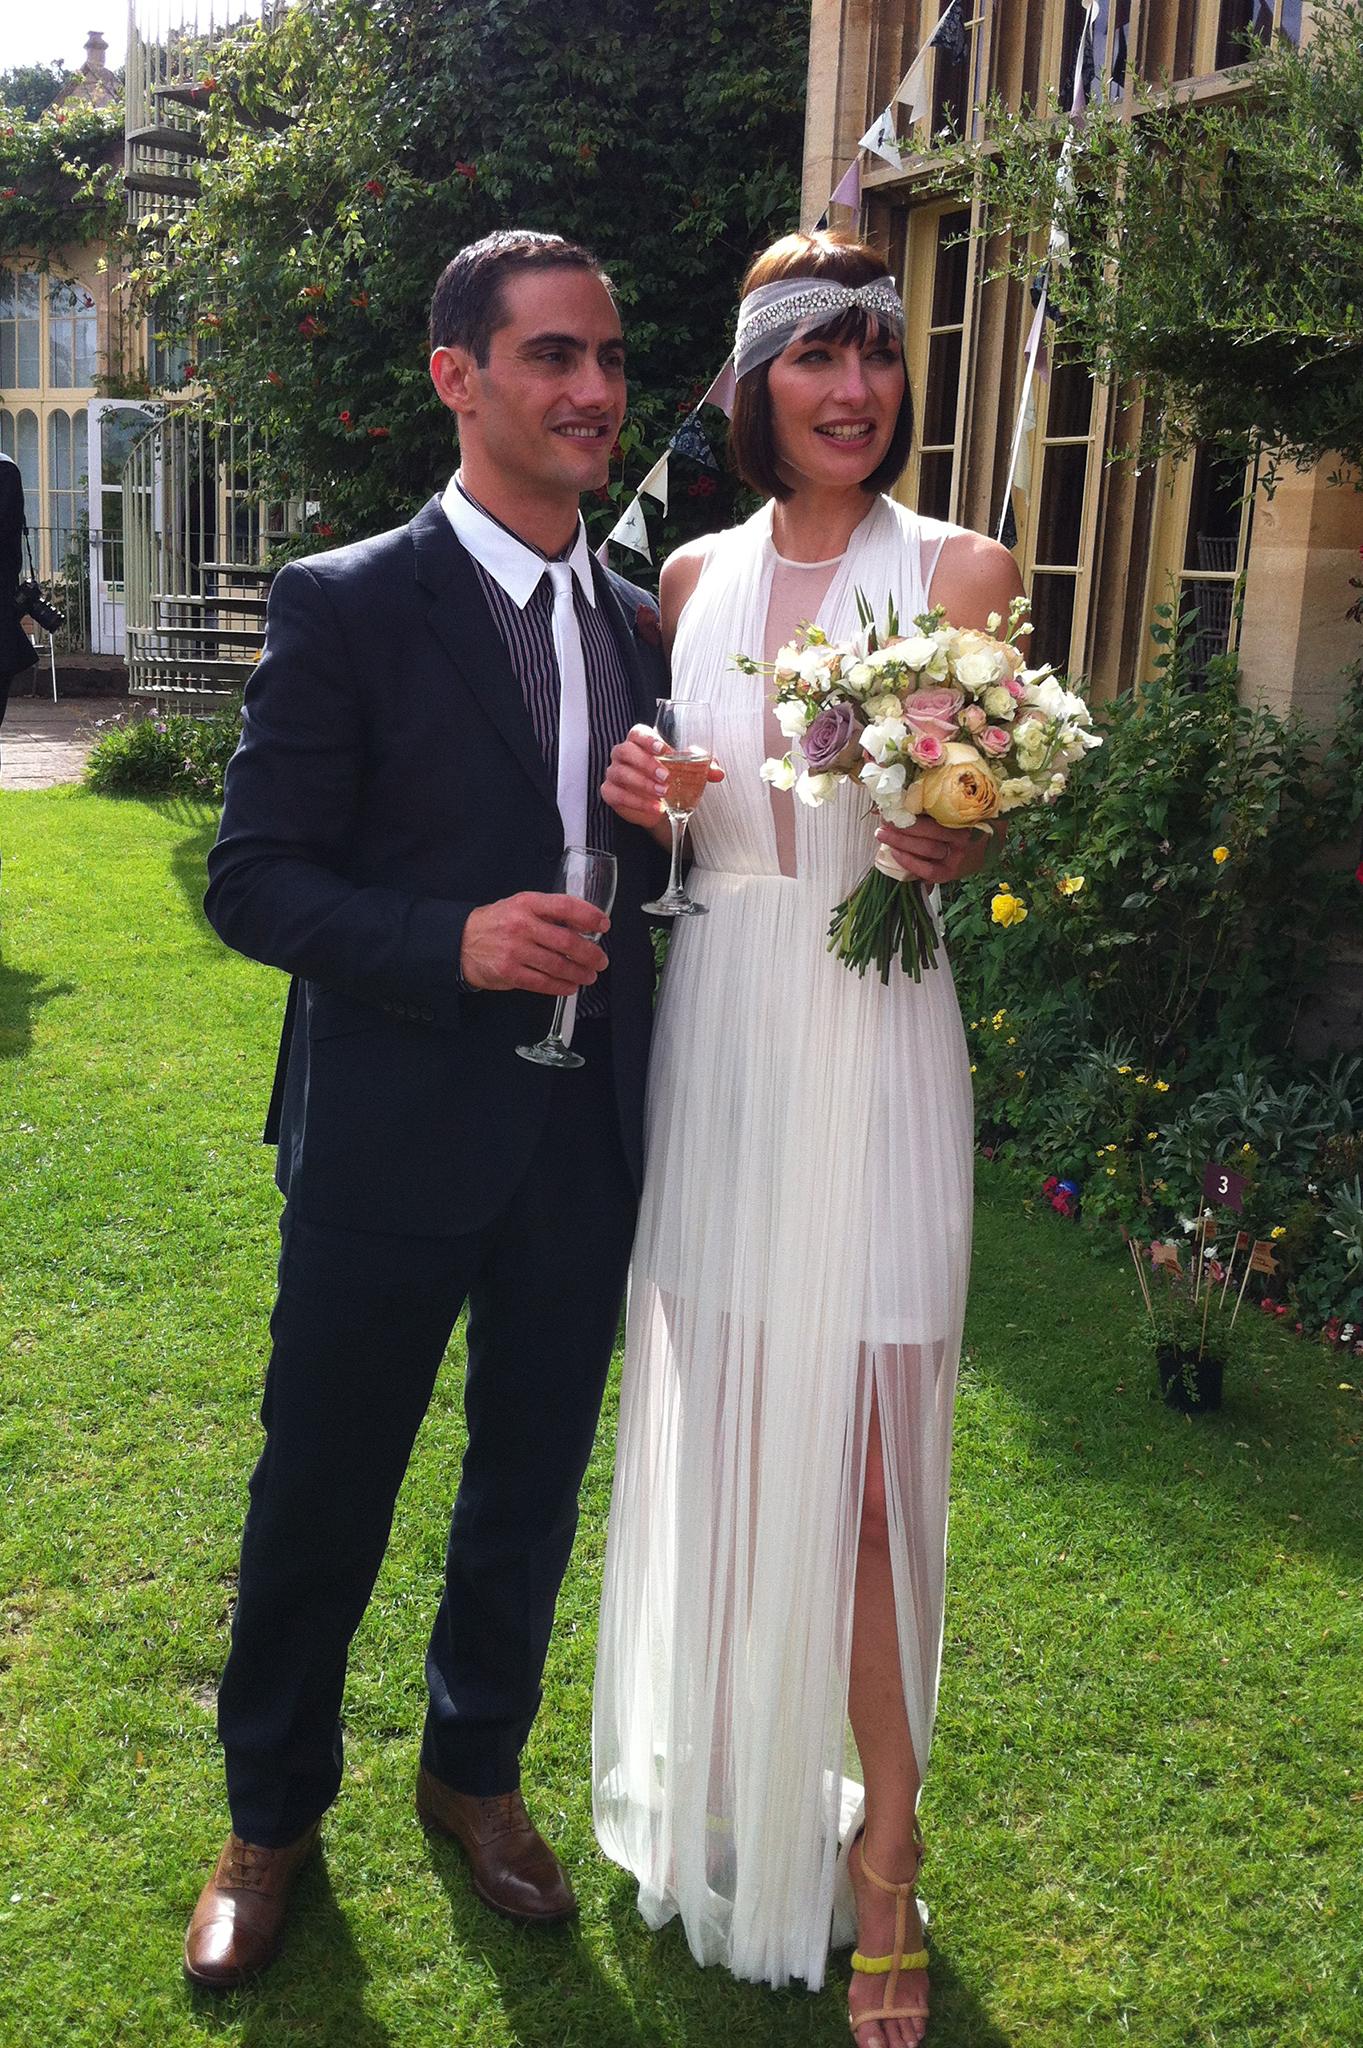 Bride - Starlie and Groom - 2012